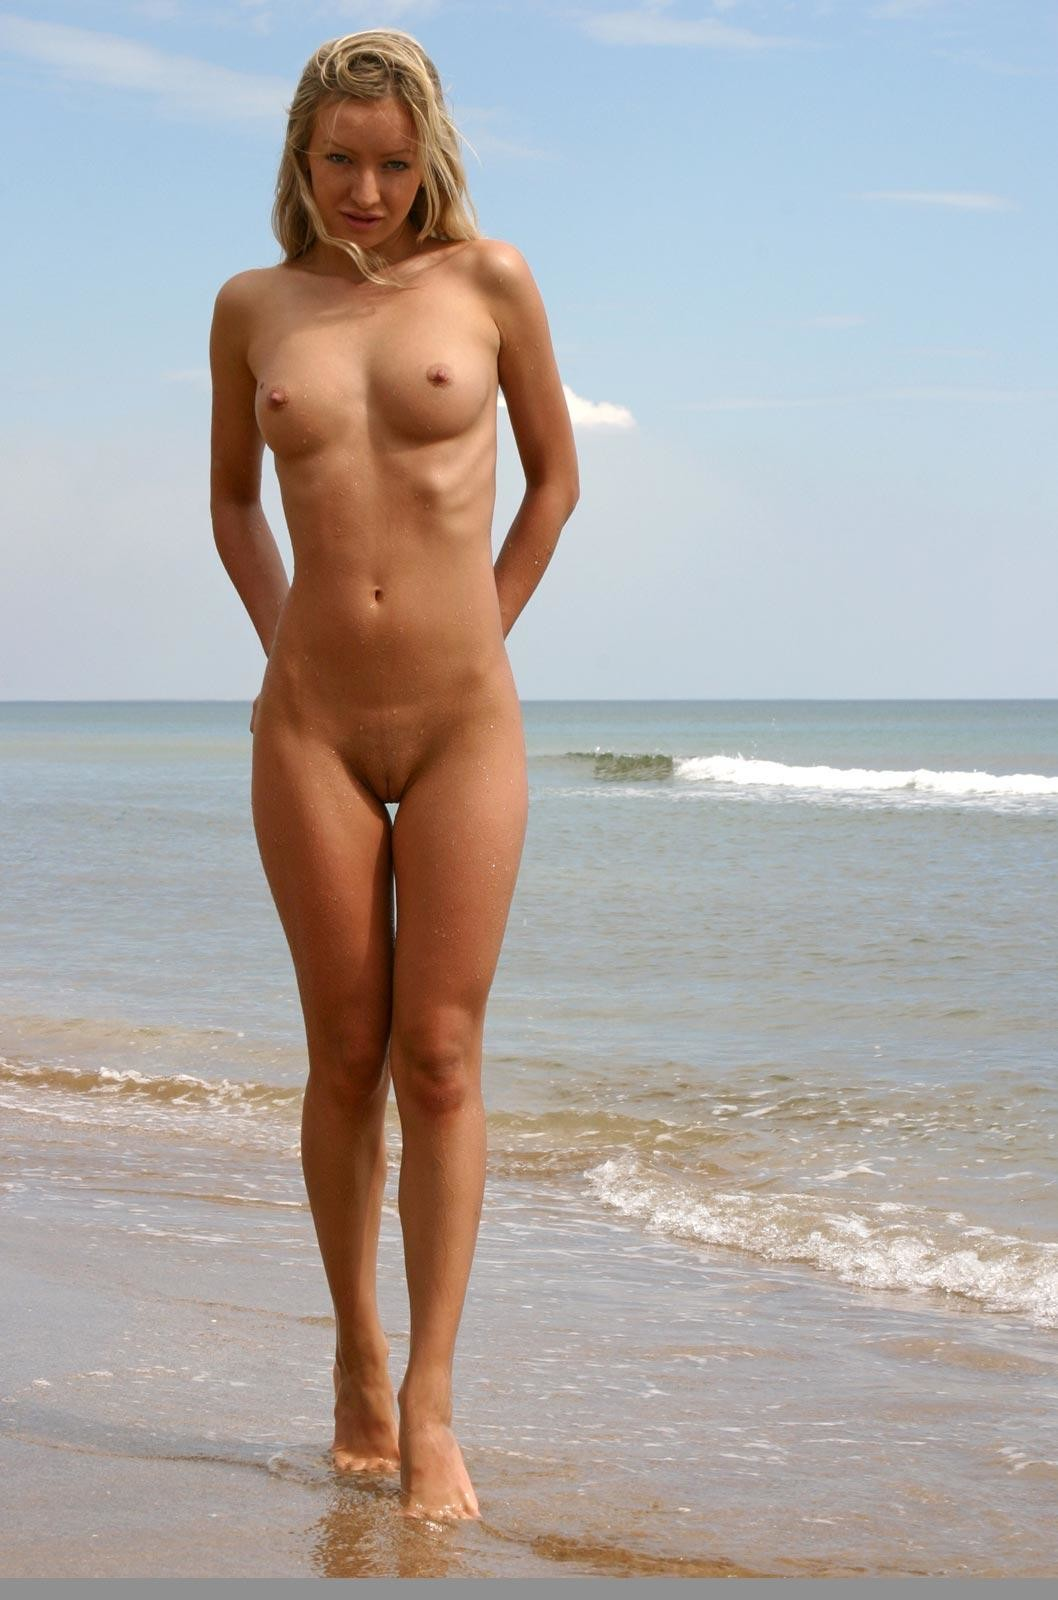 golie-na-morskih-plyazhah